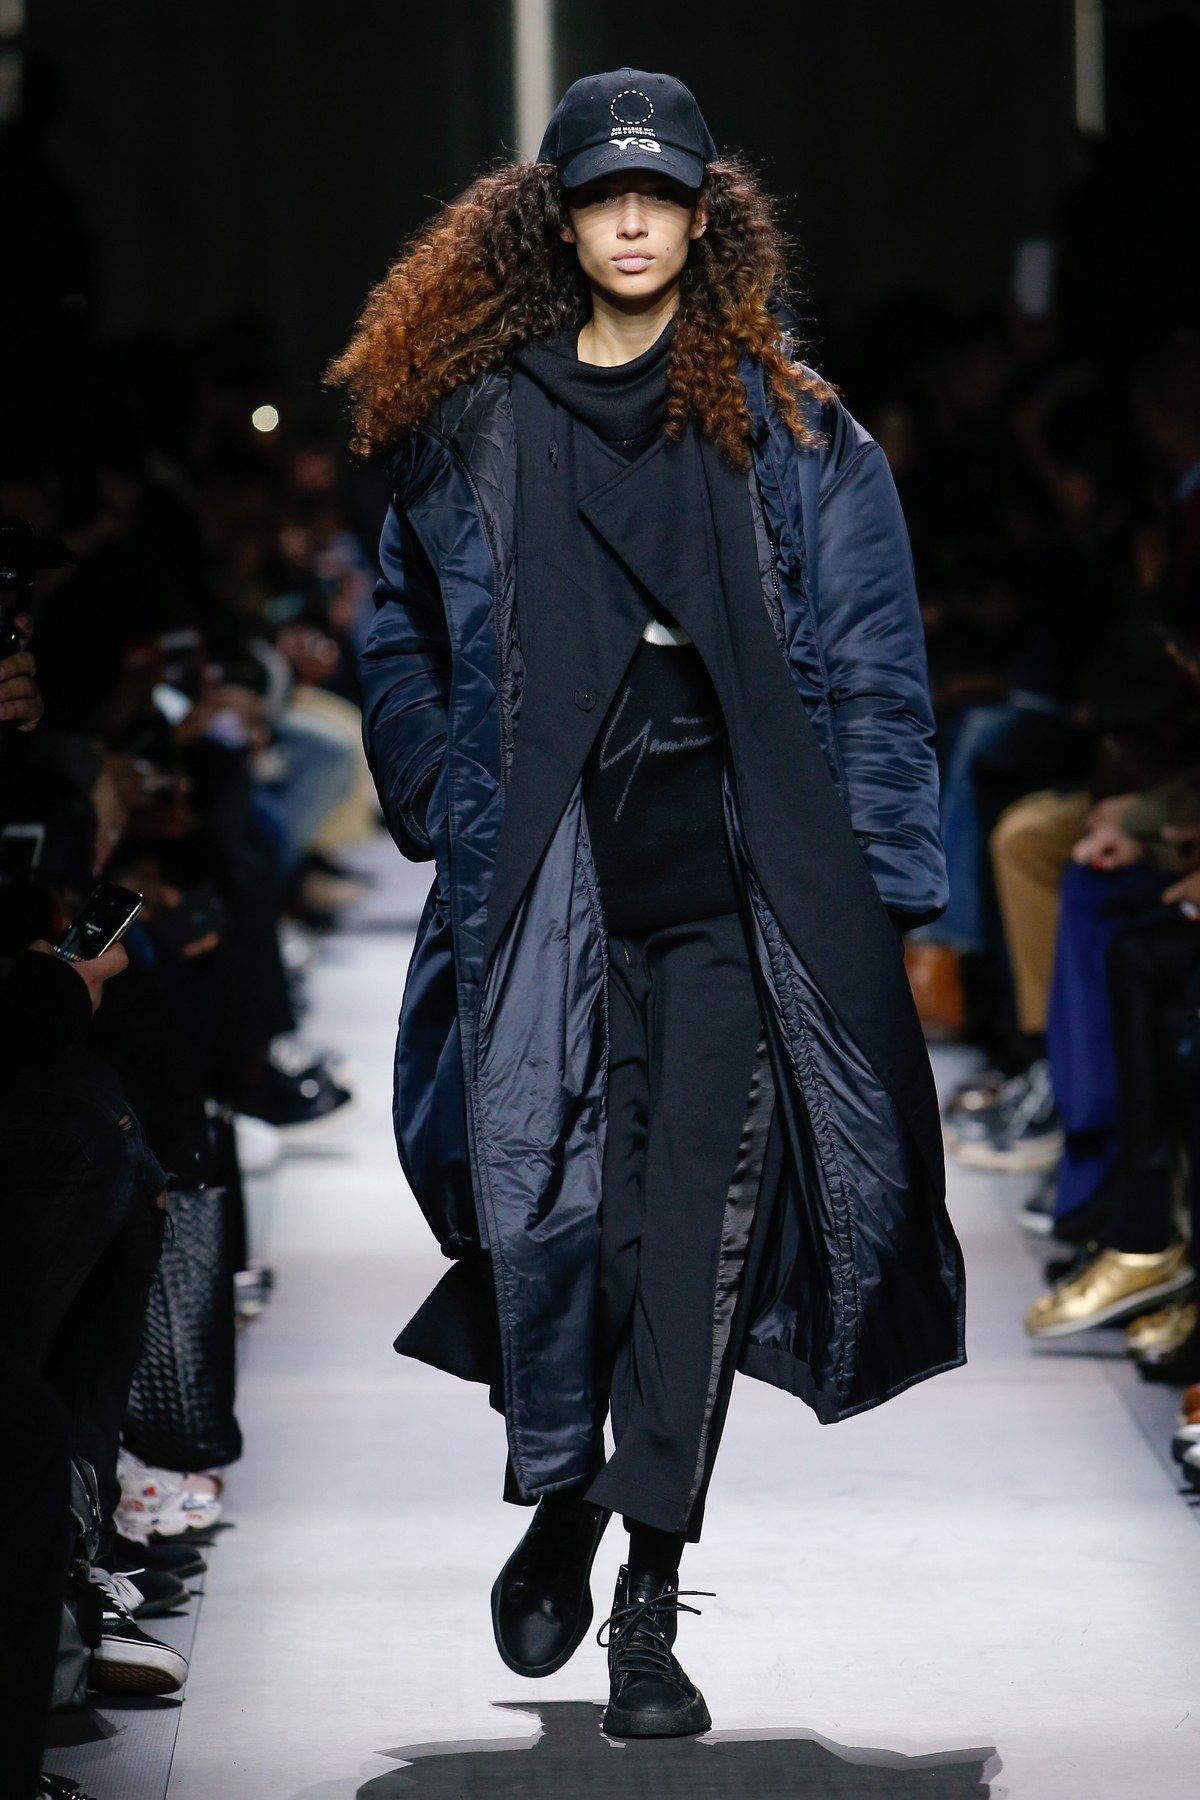 Fashion week Models female at menswear shows for girls